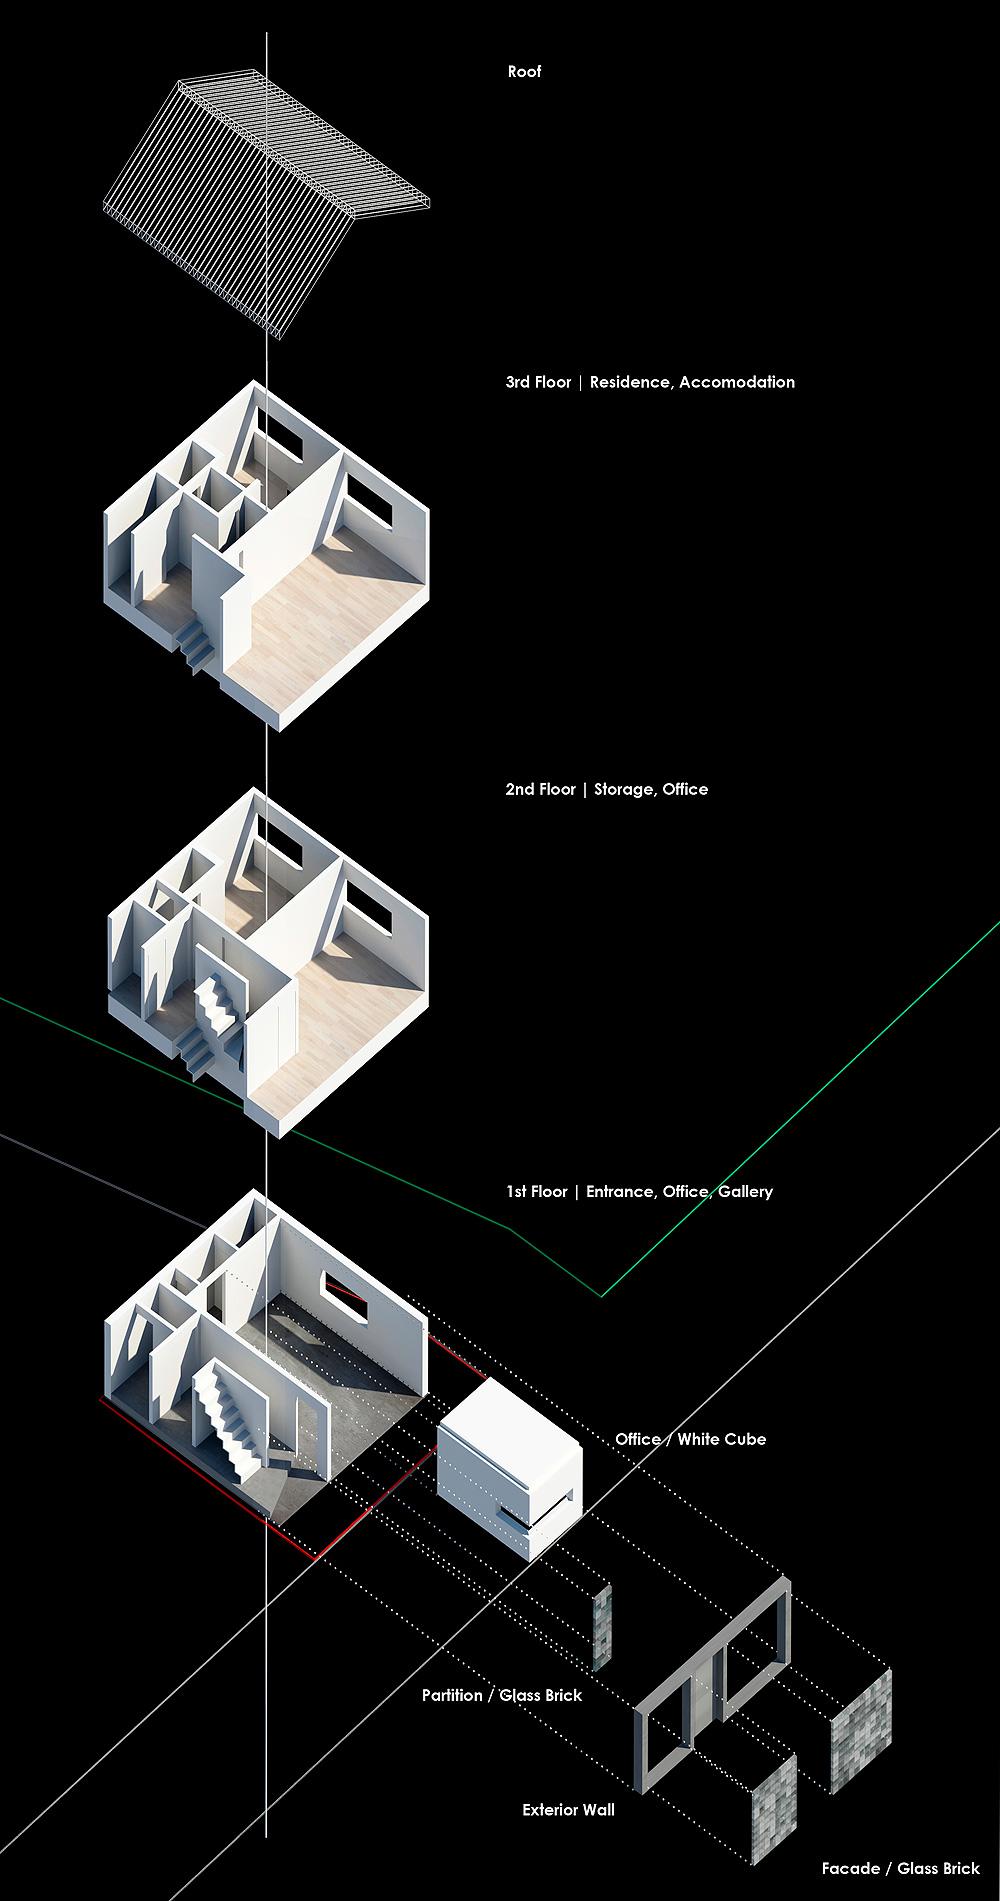 vivienda y galeria de arte jun murata (20)